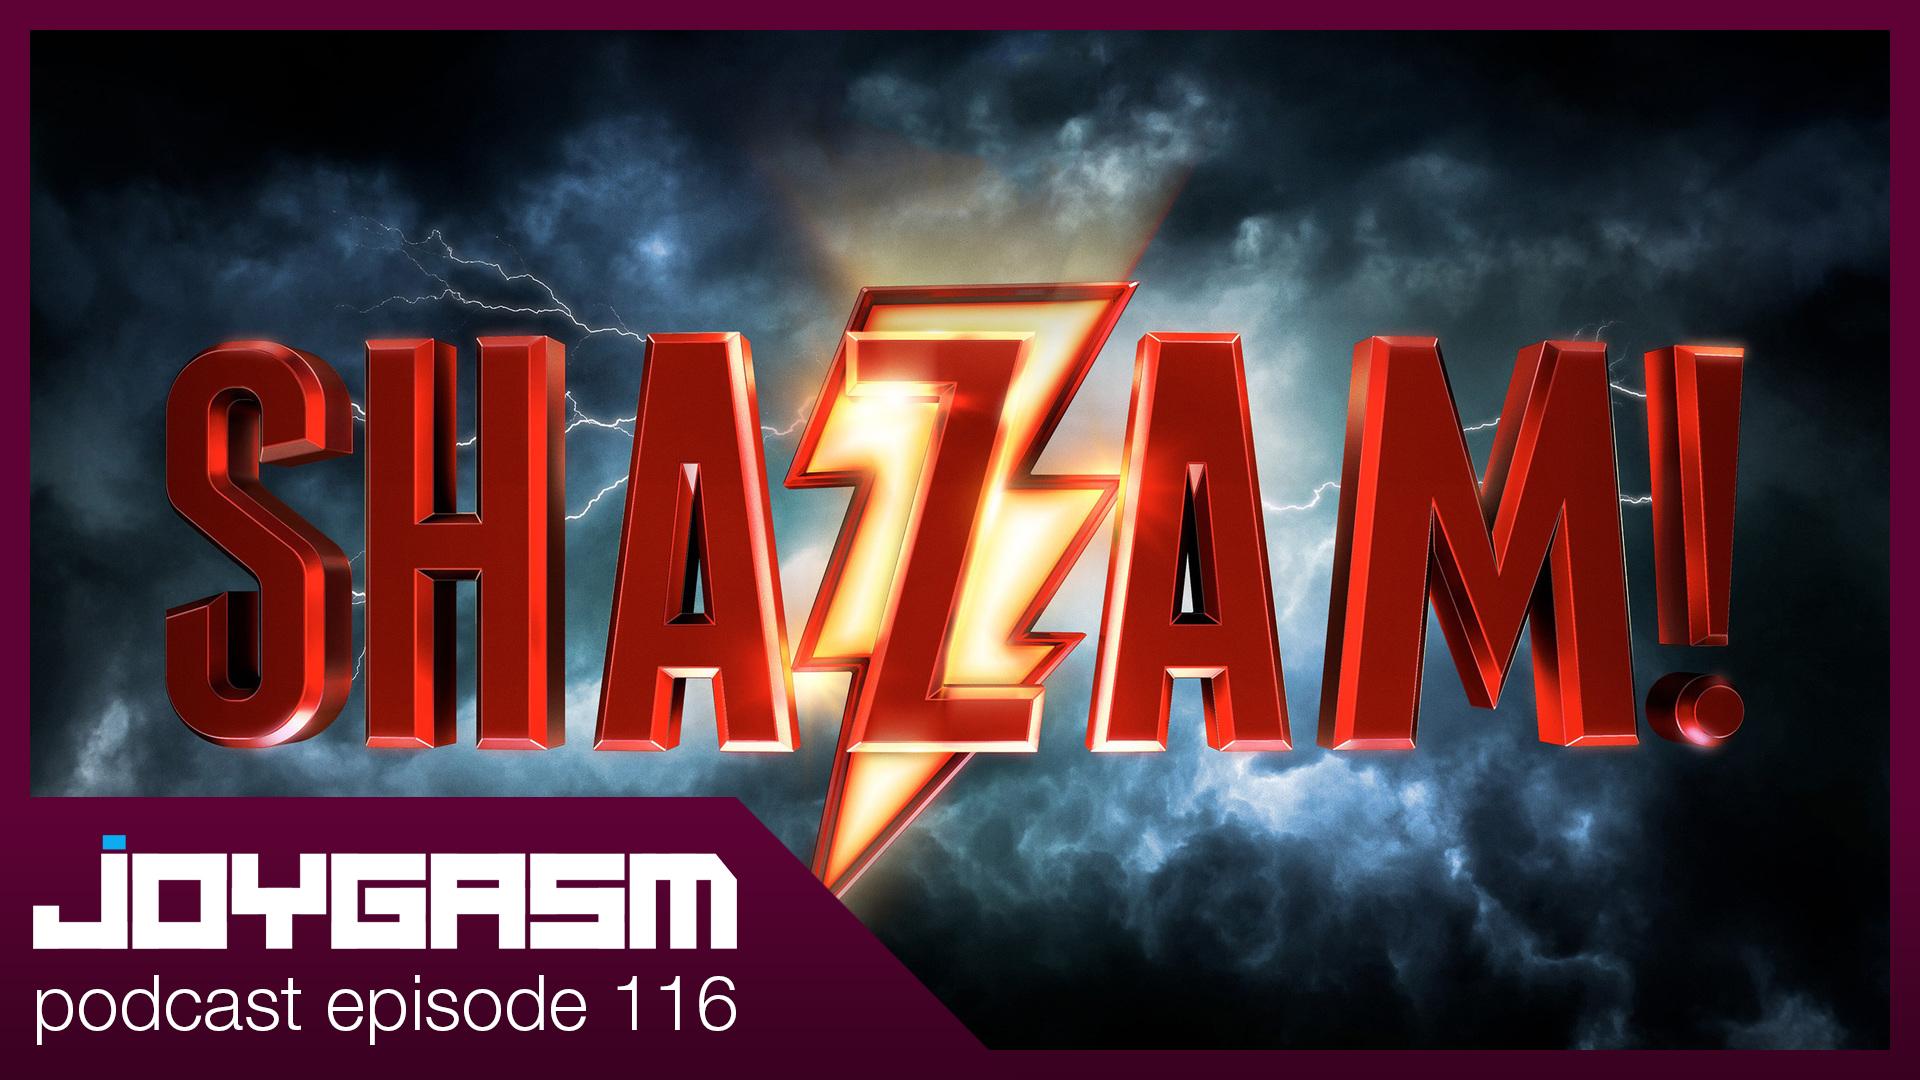 Ep. 116: Shazam! Movie Review, Joker Trailer Reactions, & More